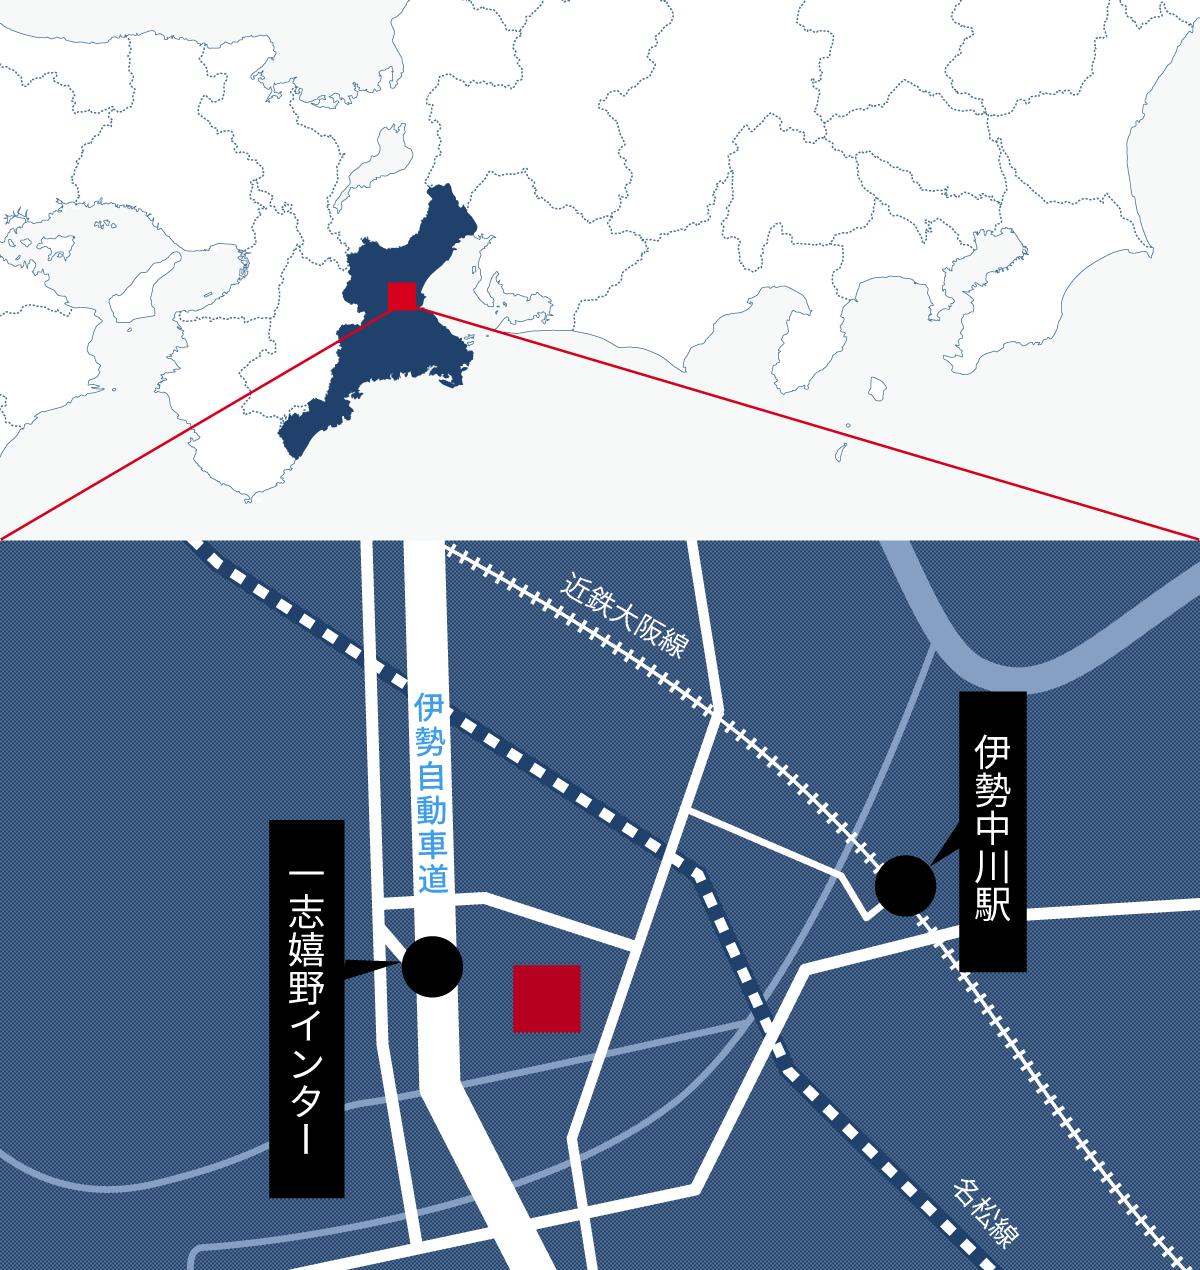 Gestamp Hot Stamping Japan(ゲスタンプ ホットスタンピング ジャパン株式会社)新工場地図